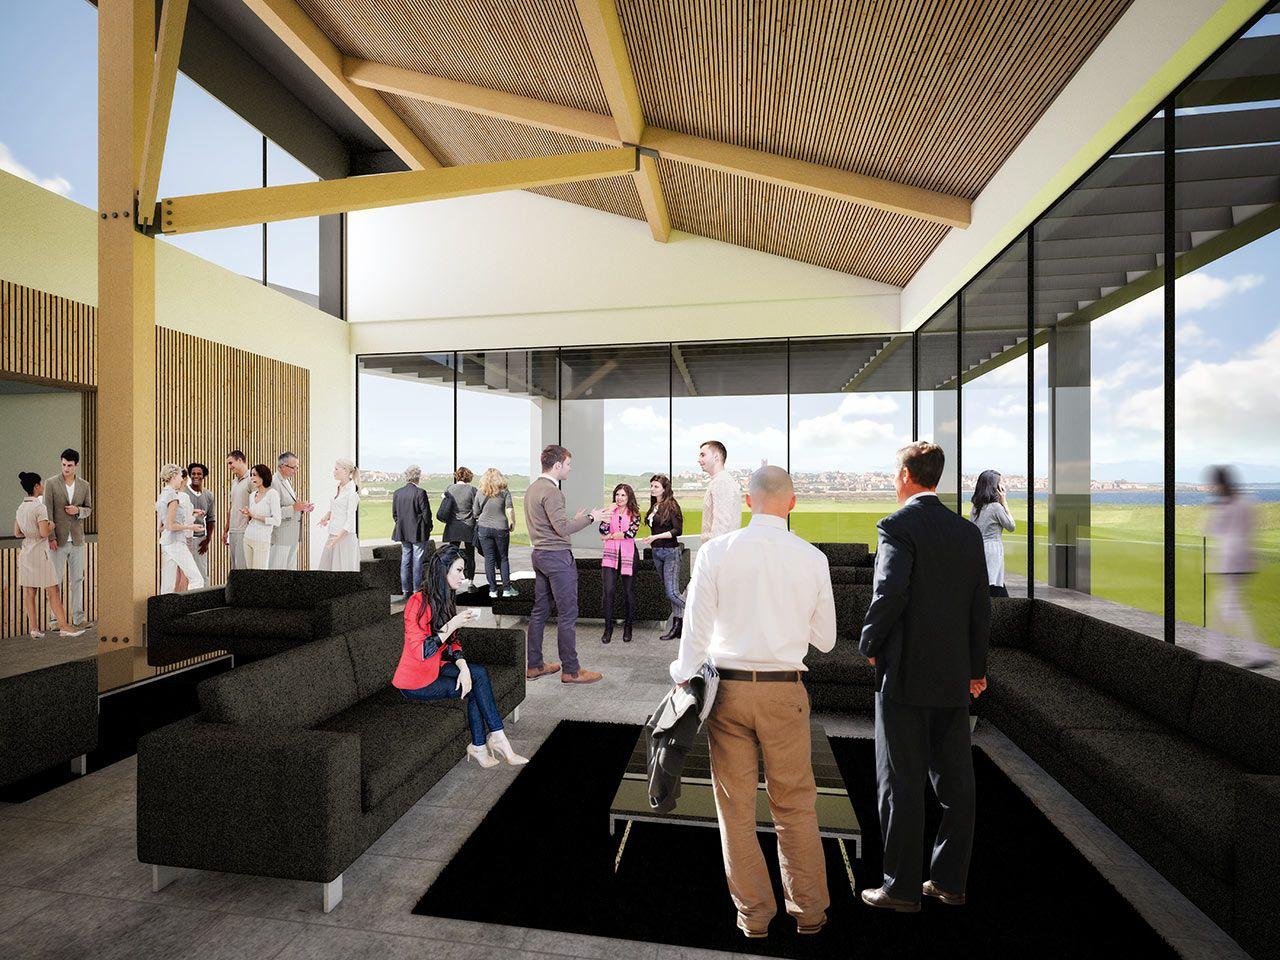 Architectural Design Projects Scotland in 2020 Club